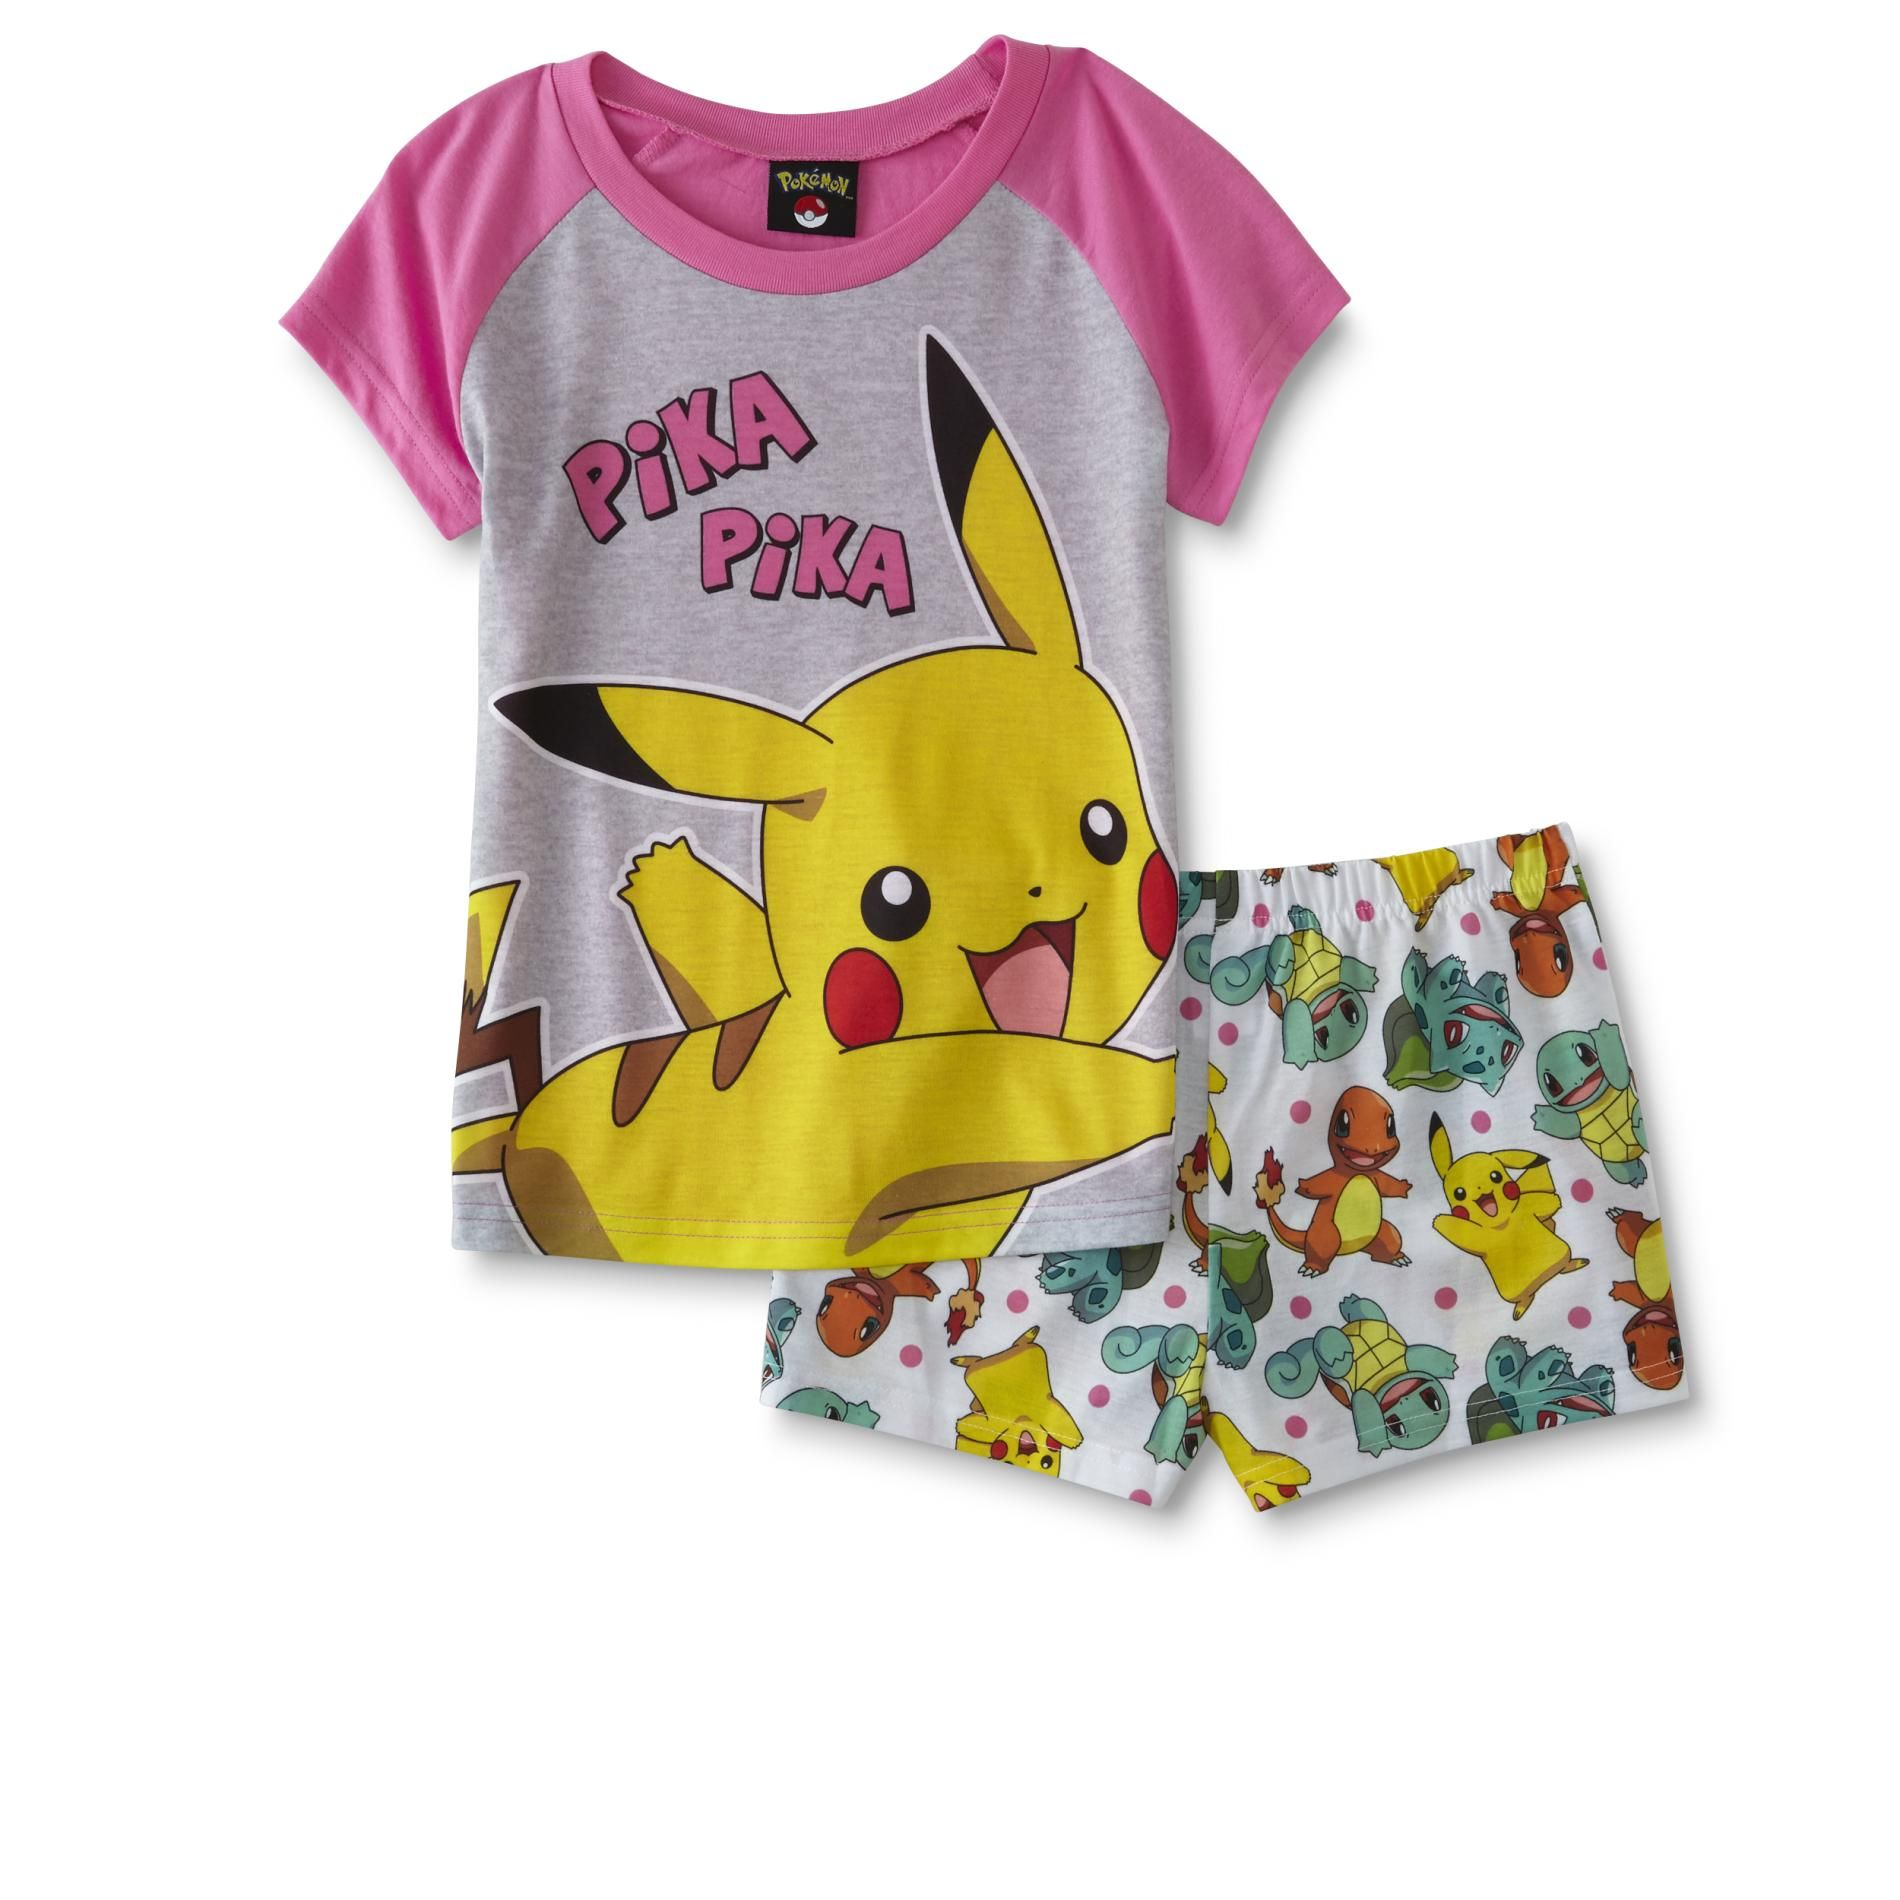 a85e817bbe77c Pokemon CCG Girls' Pajama T-Shirt & Shorts - Pikachu | Party PJ's :D ...